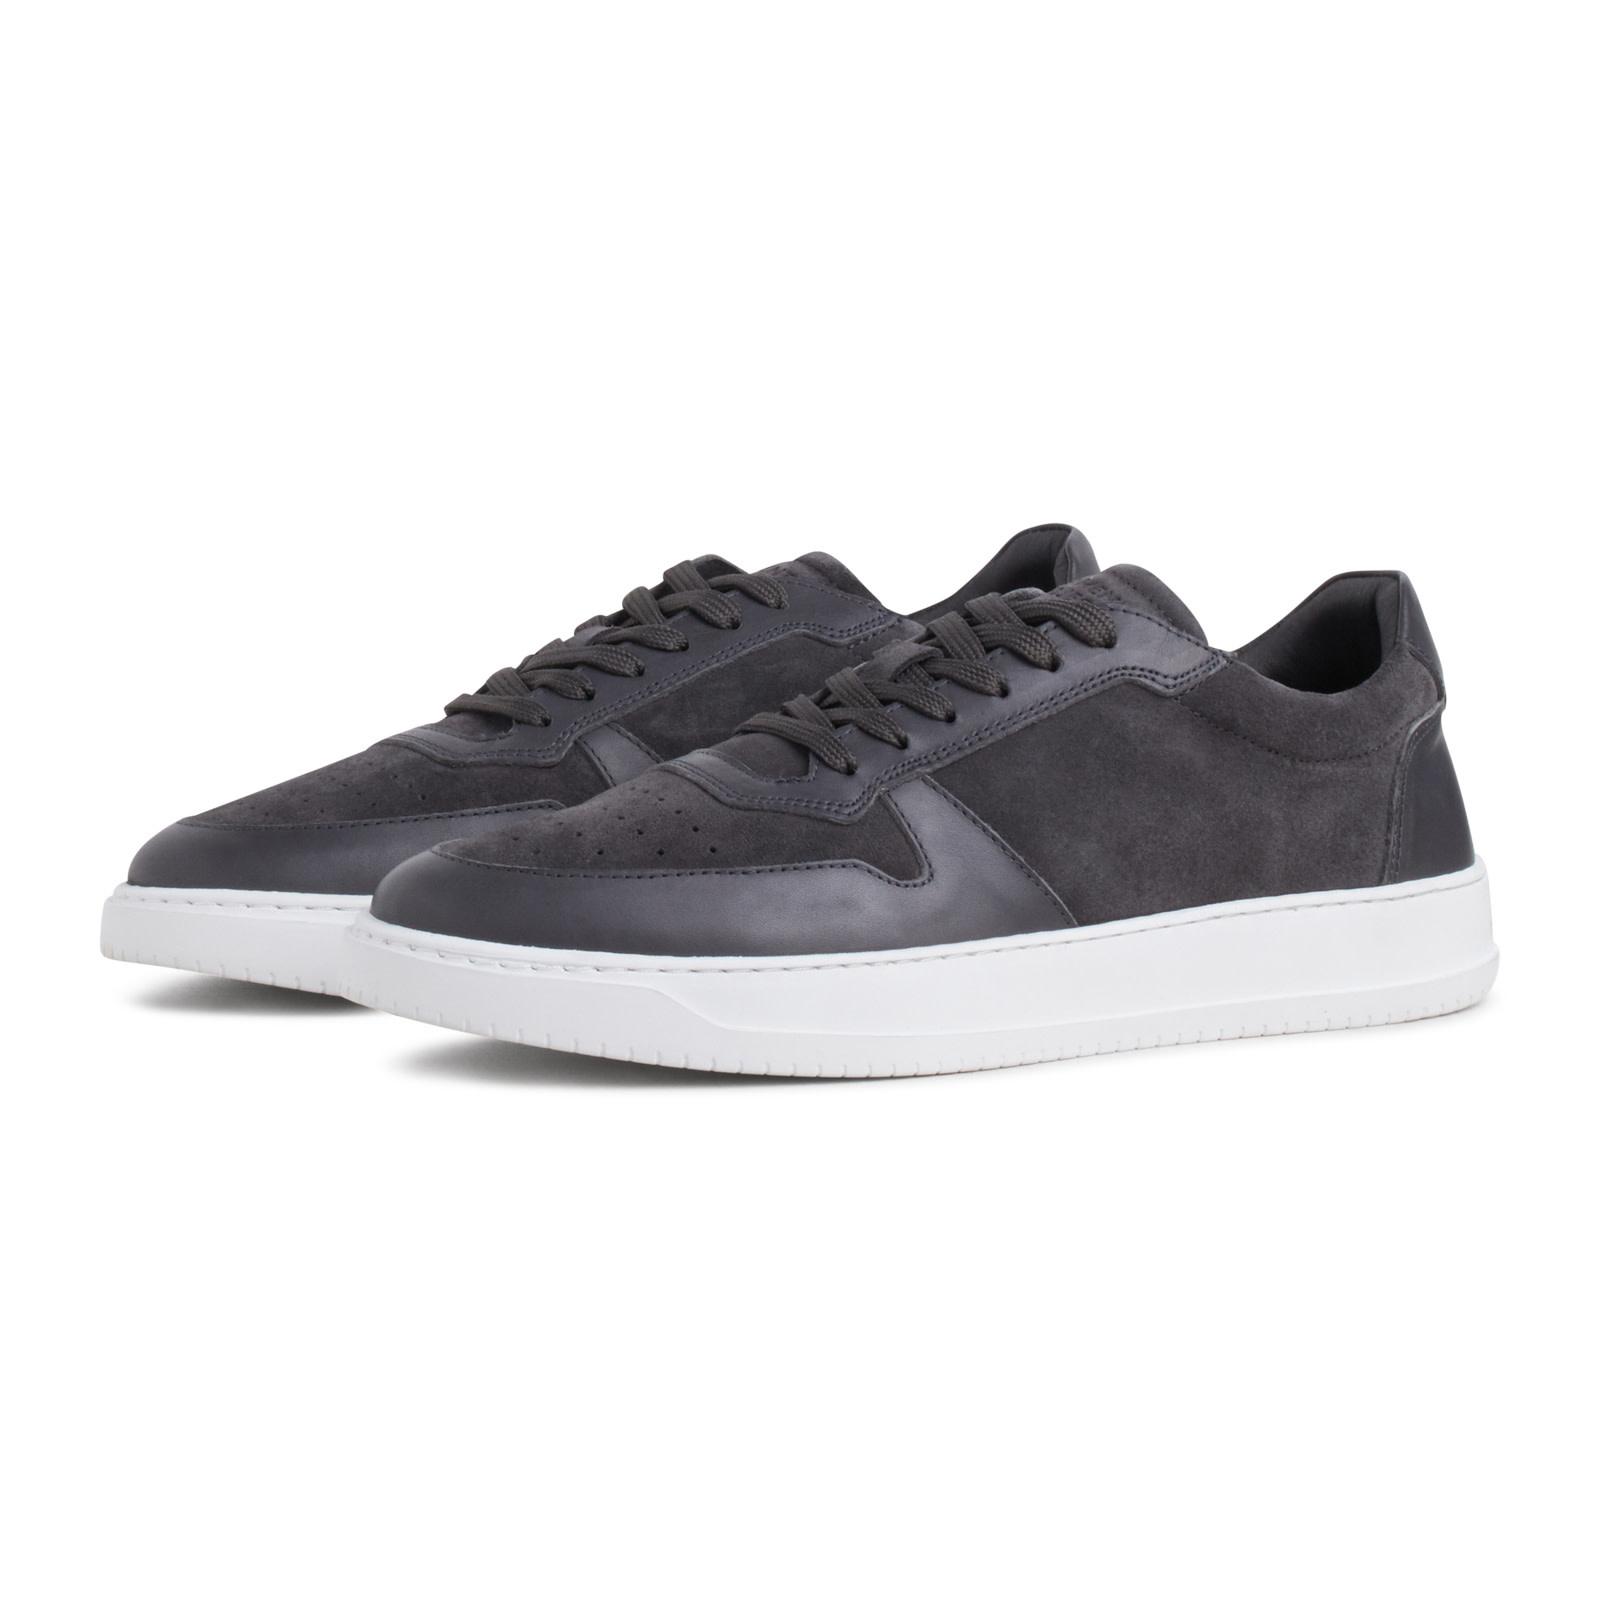 Garment Project Garment Project Legacy Leather Sneaker Dark Grey